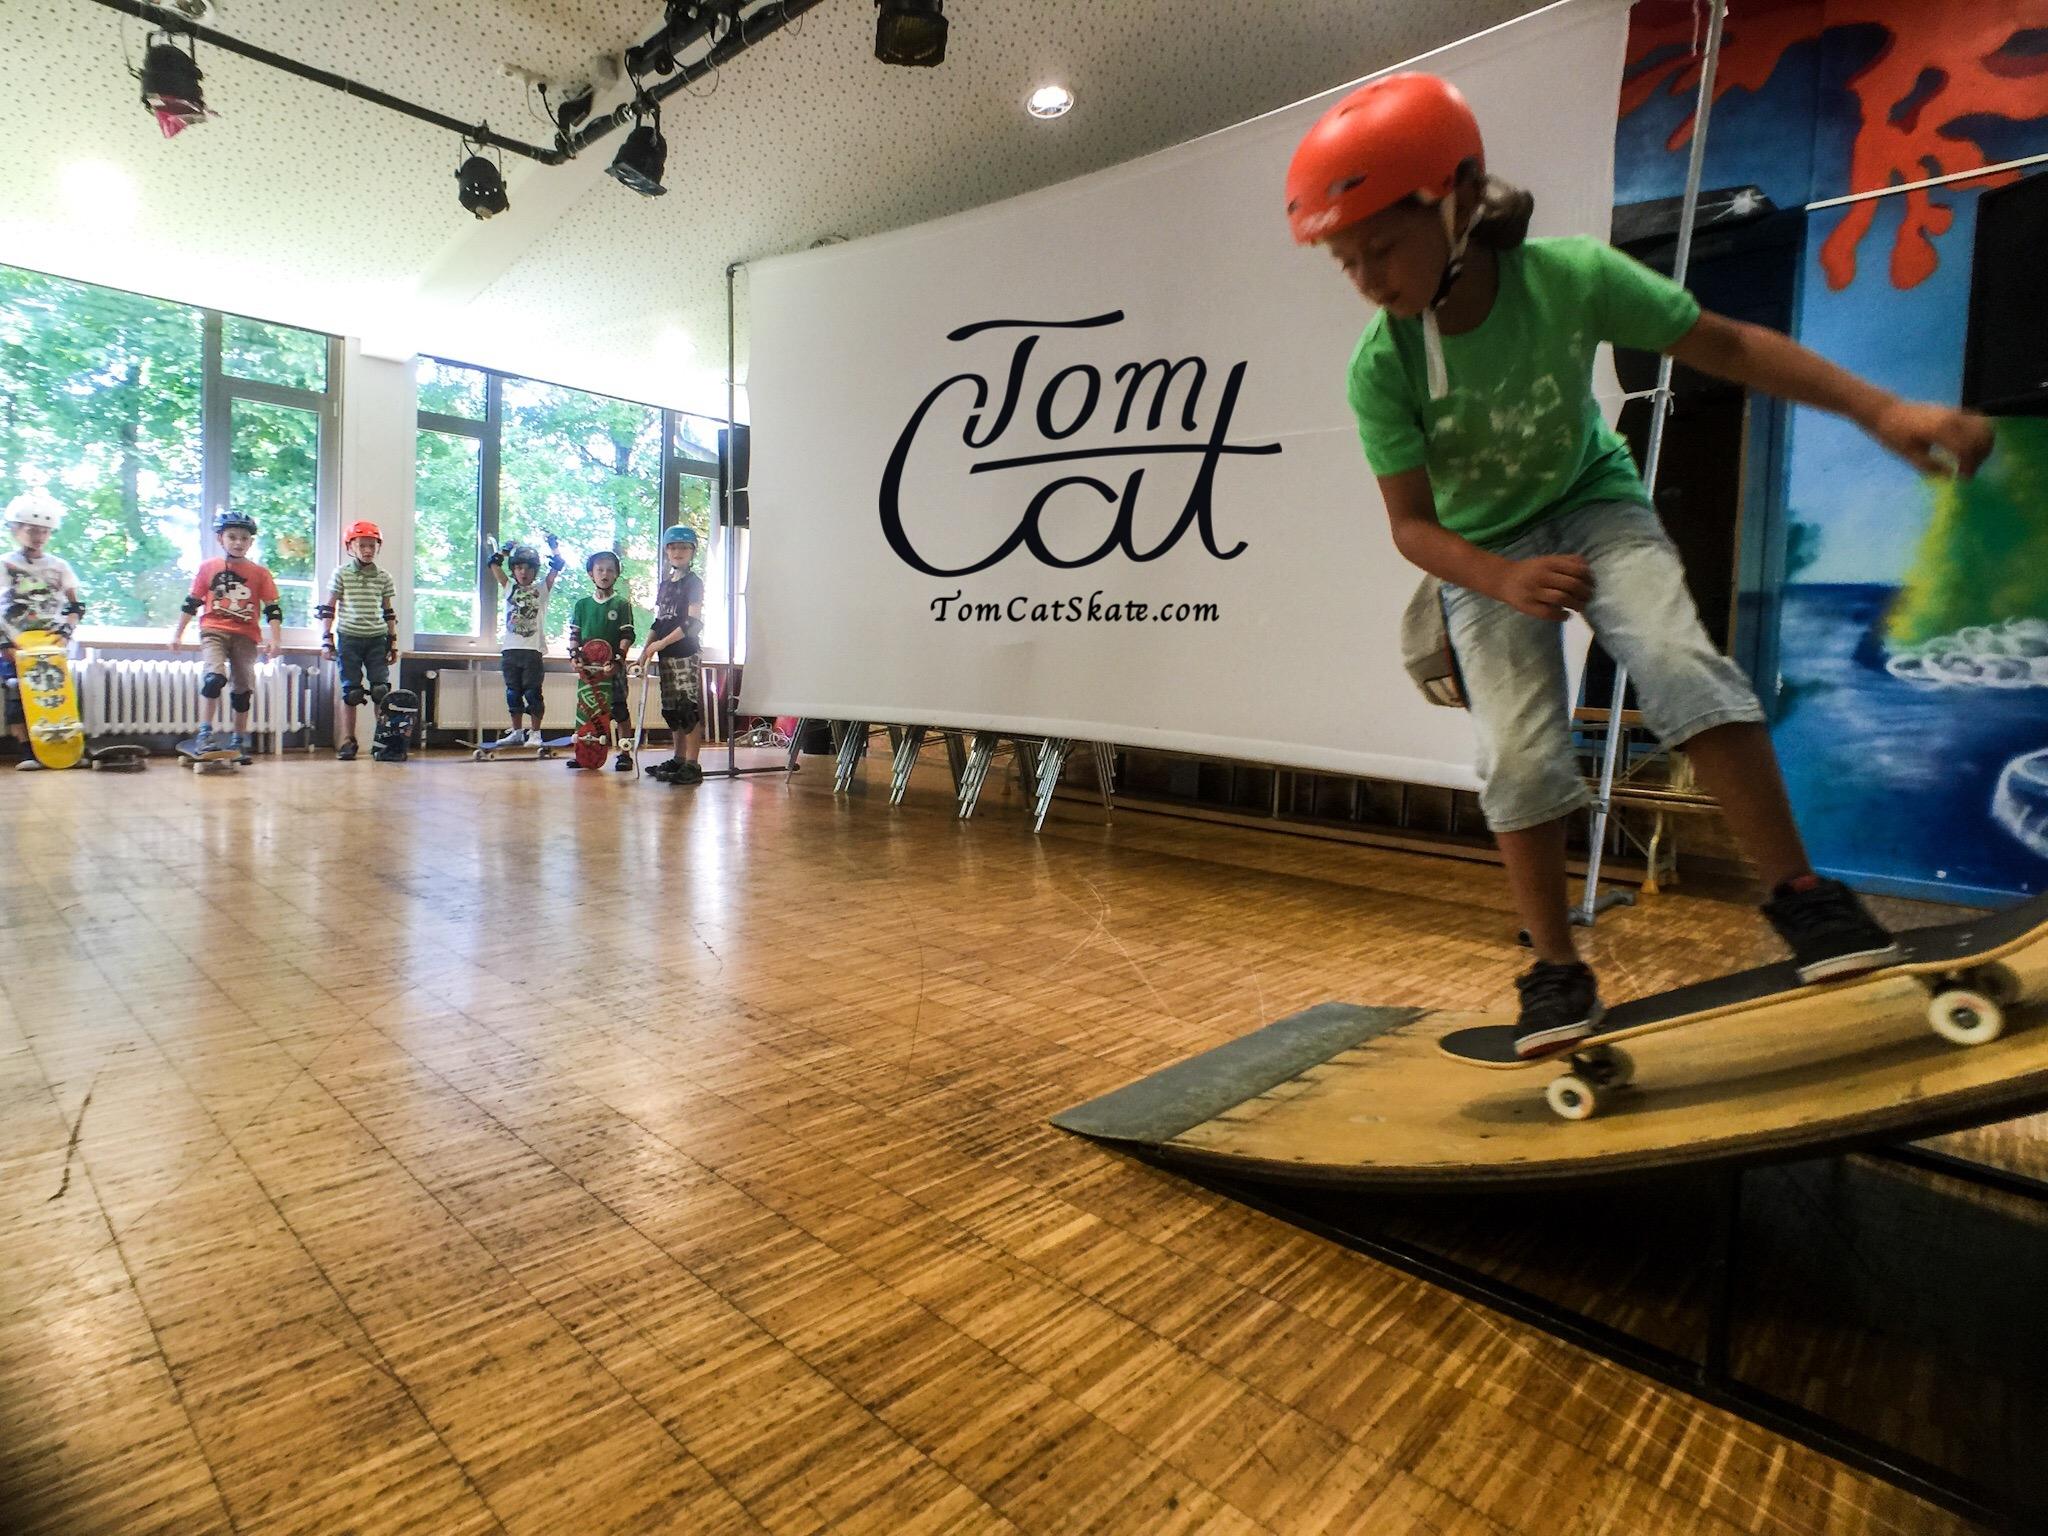 Skatekurs München Bad Tölz Jugendcafe mit Profi Skateboarder Tom Cat Kleinhans.JPG